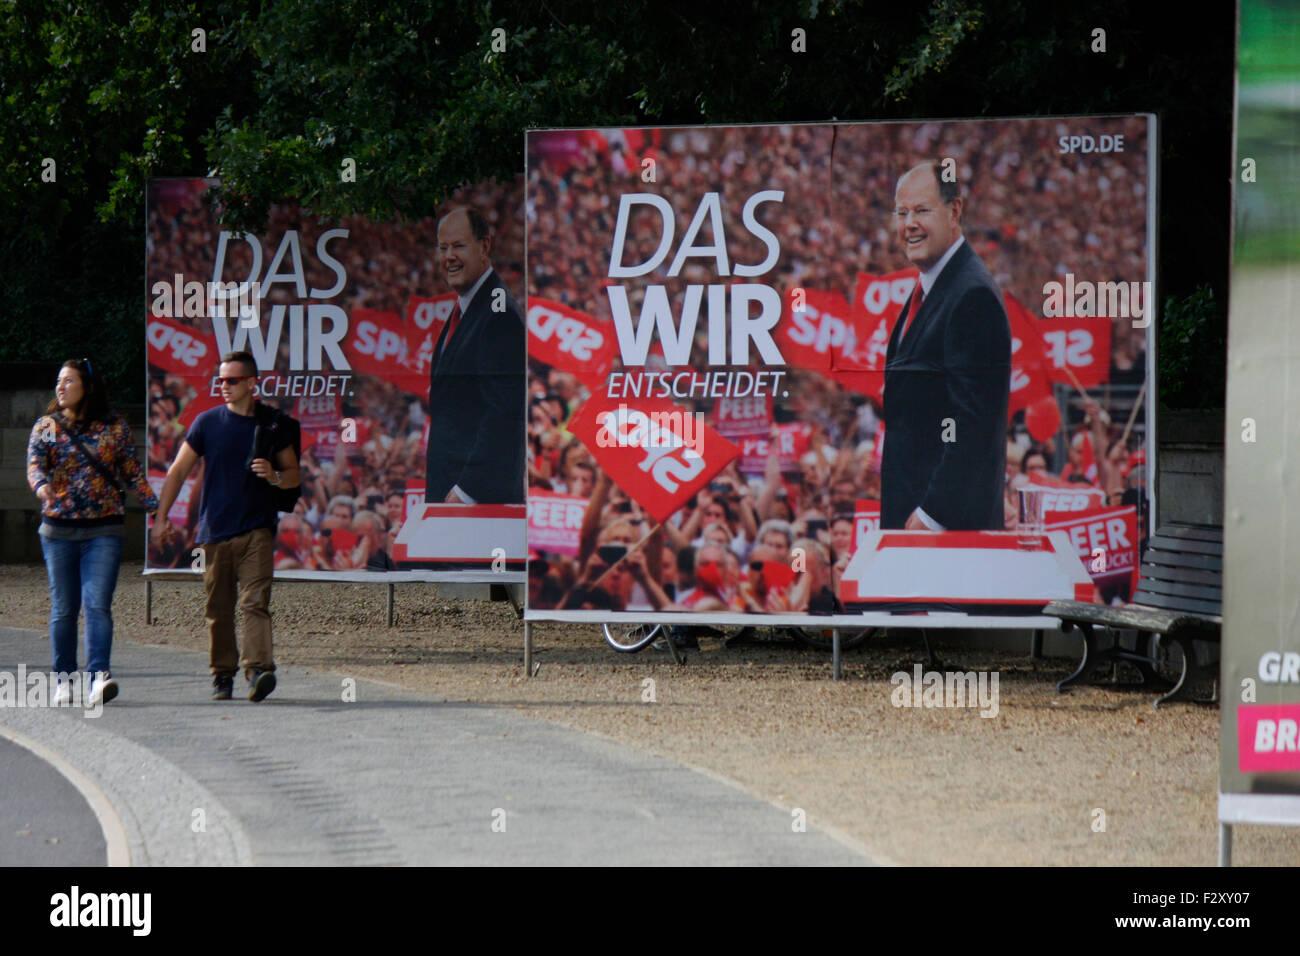 Wahlplakate zur Bundestagswahl 2013: SPD mit Peer Steinbrueck, 13. September 2013, Grosser Stern, Berlin-Tiergarten - Stock Image